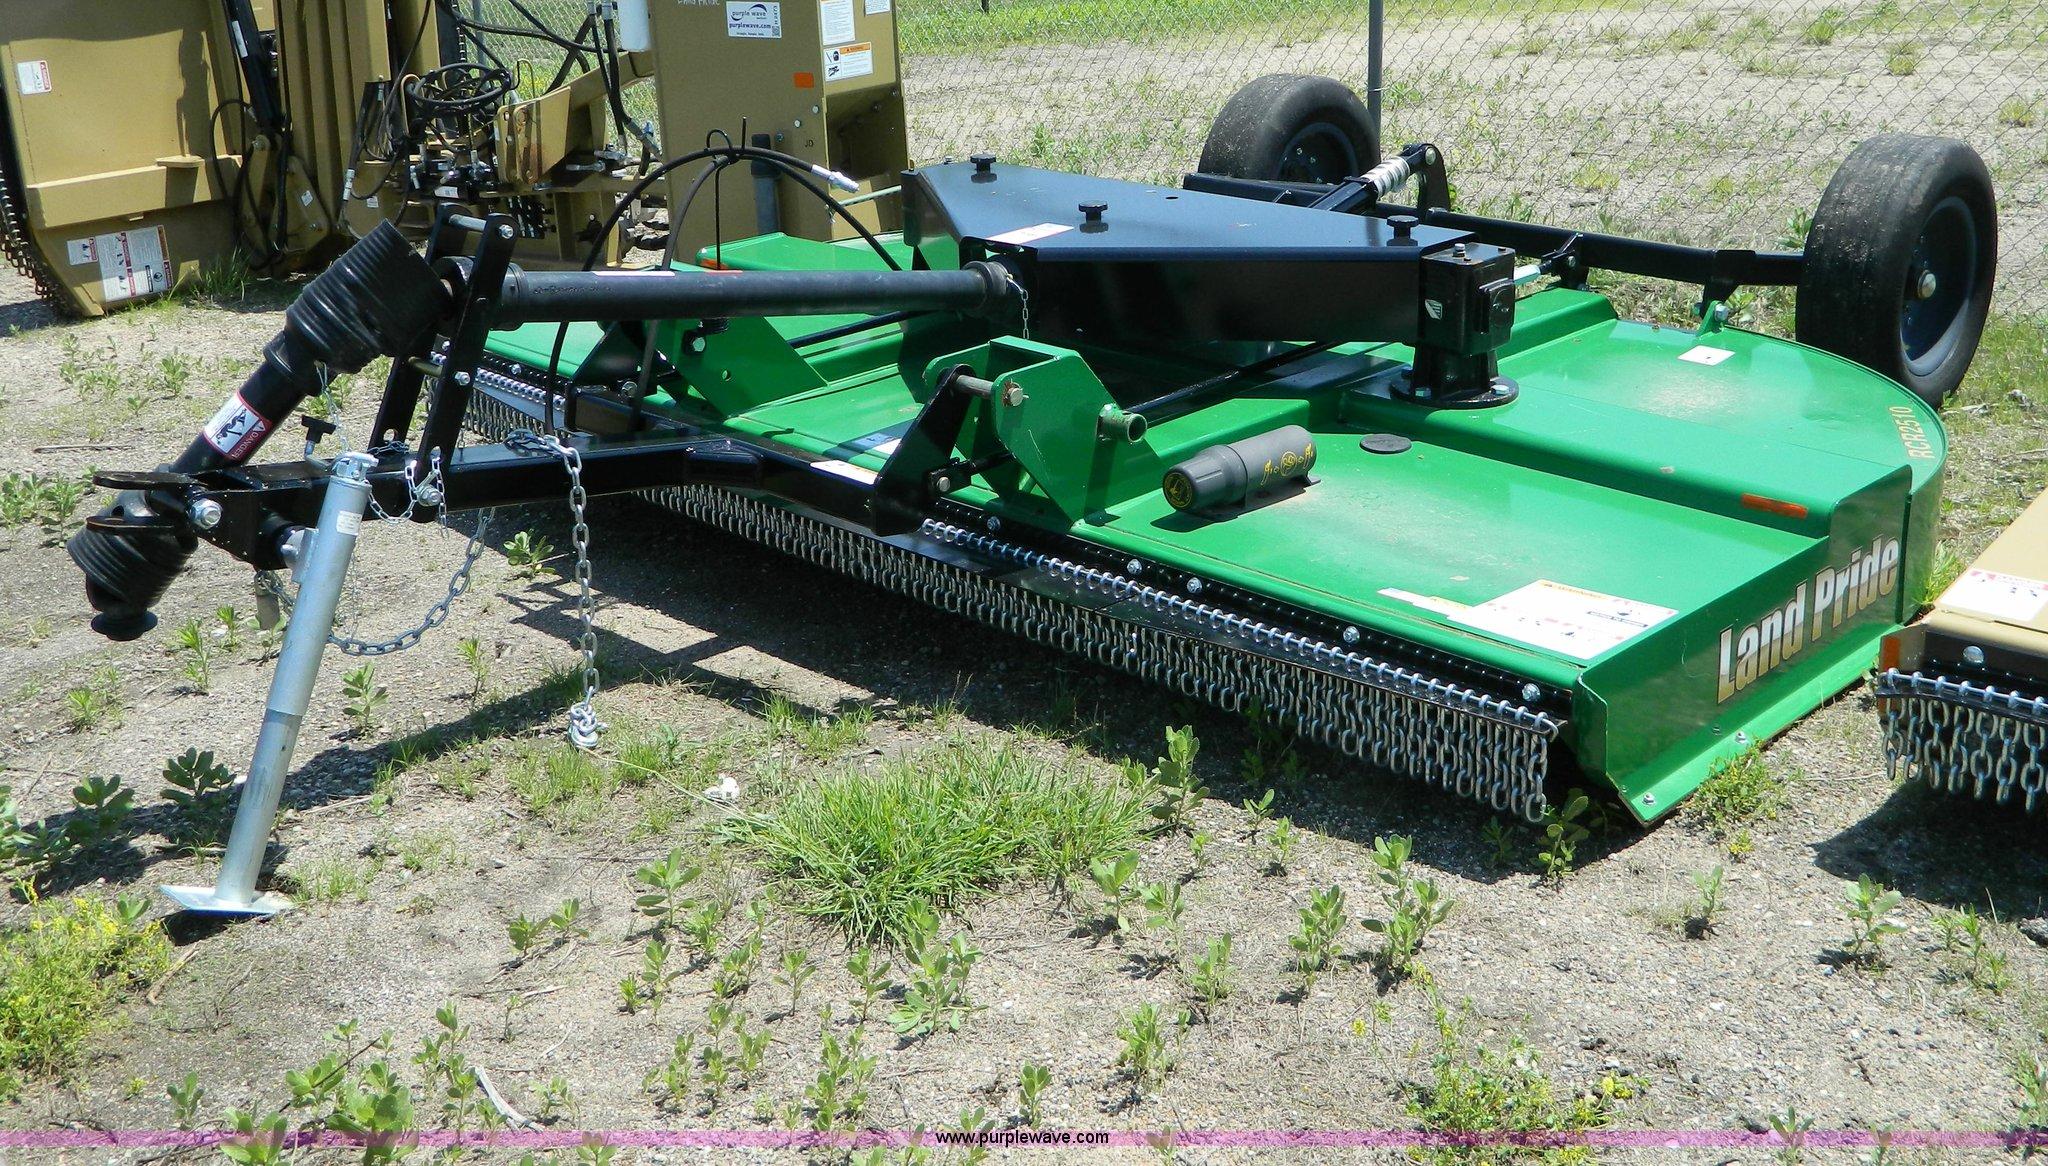 Land Pride RCR2510 rotary mower | Item AD9800 | SOLD! July 1